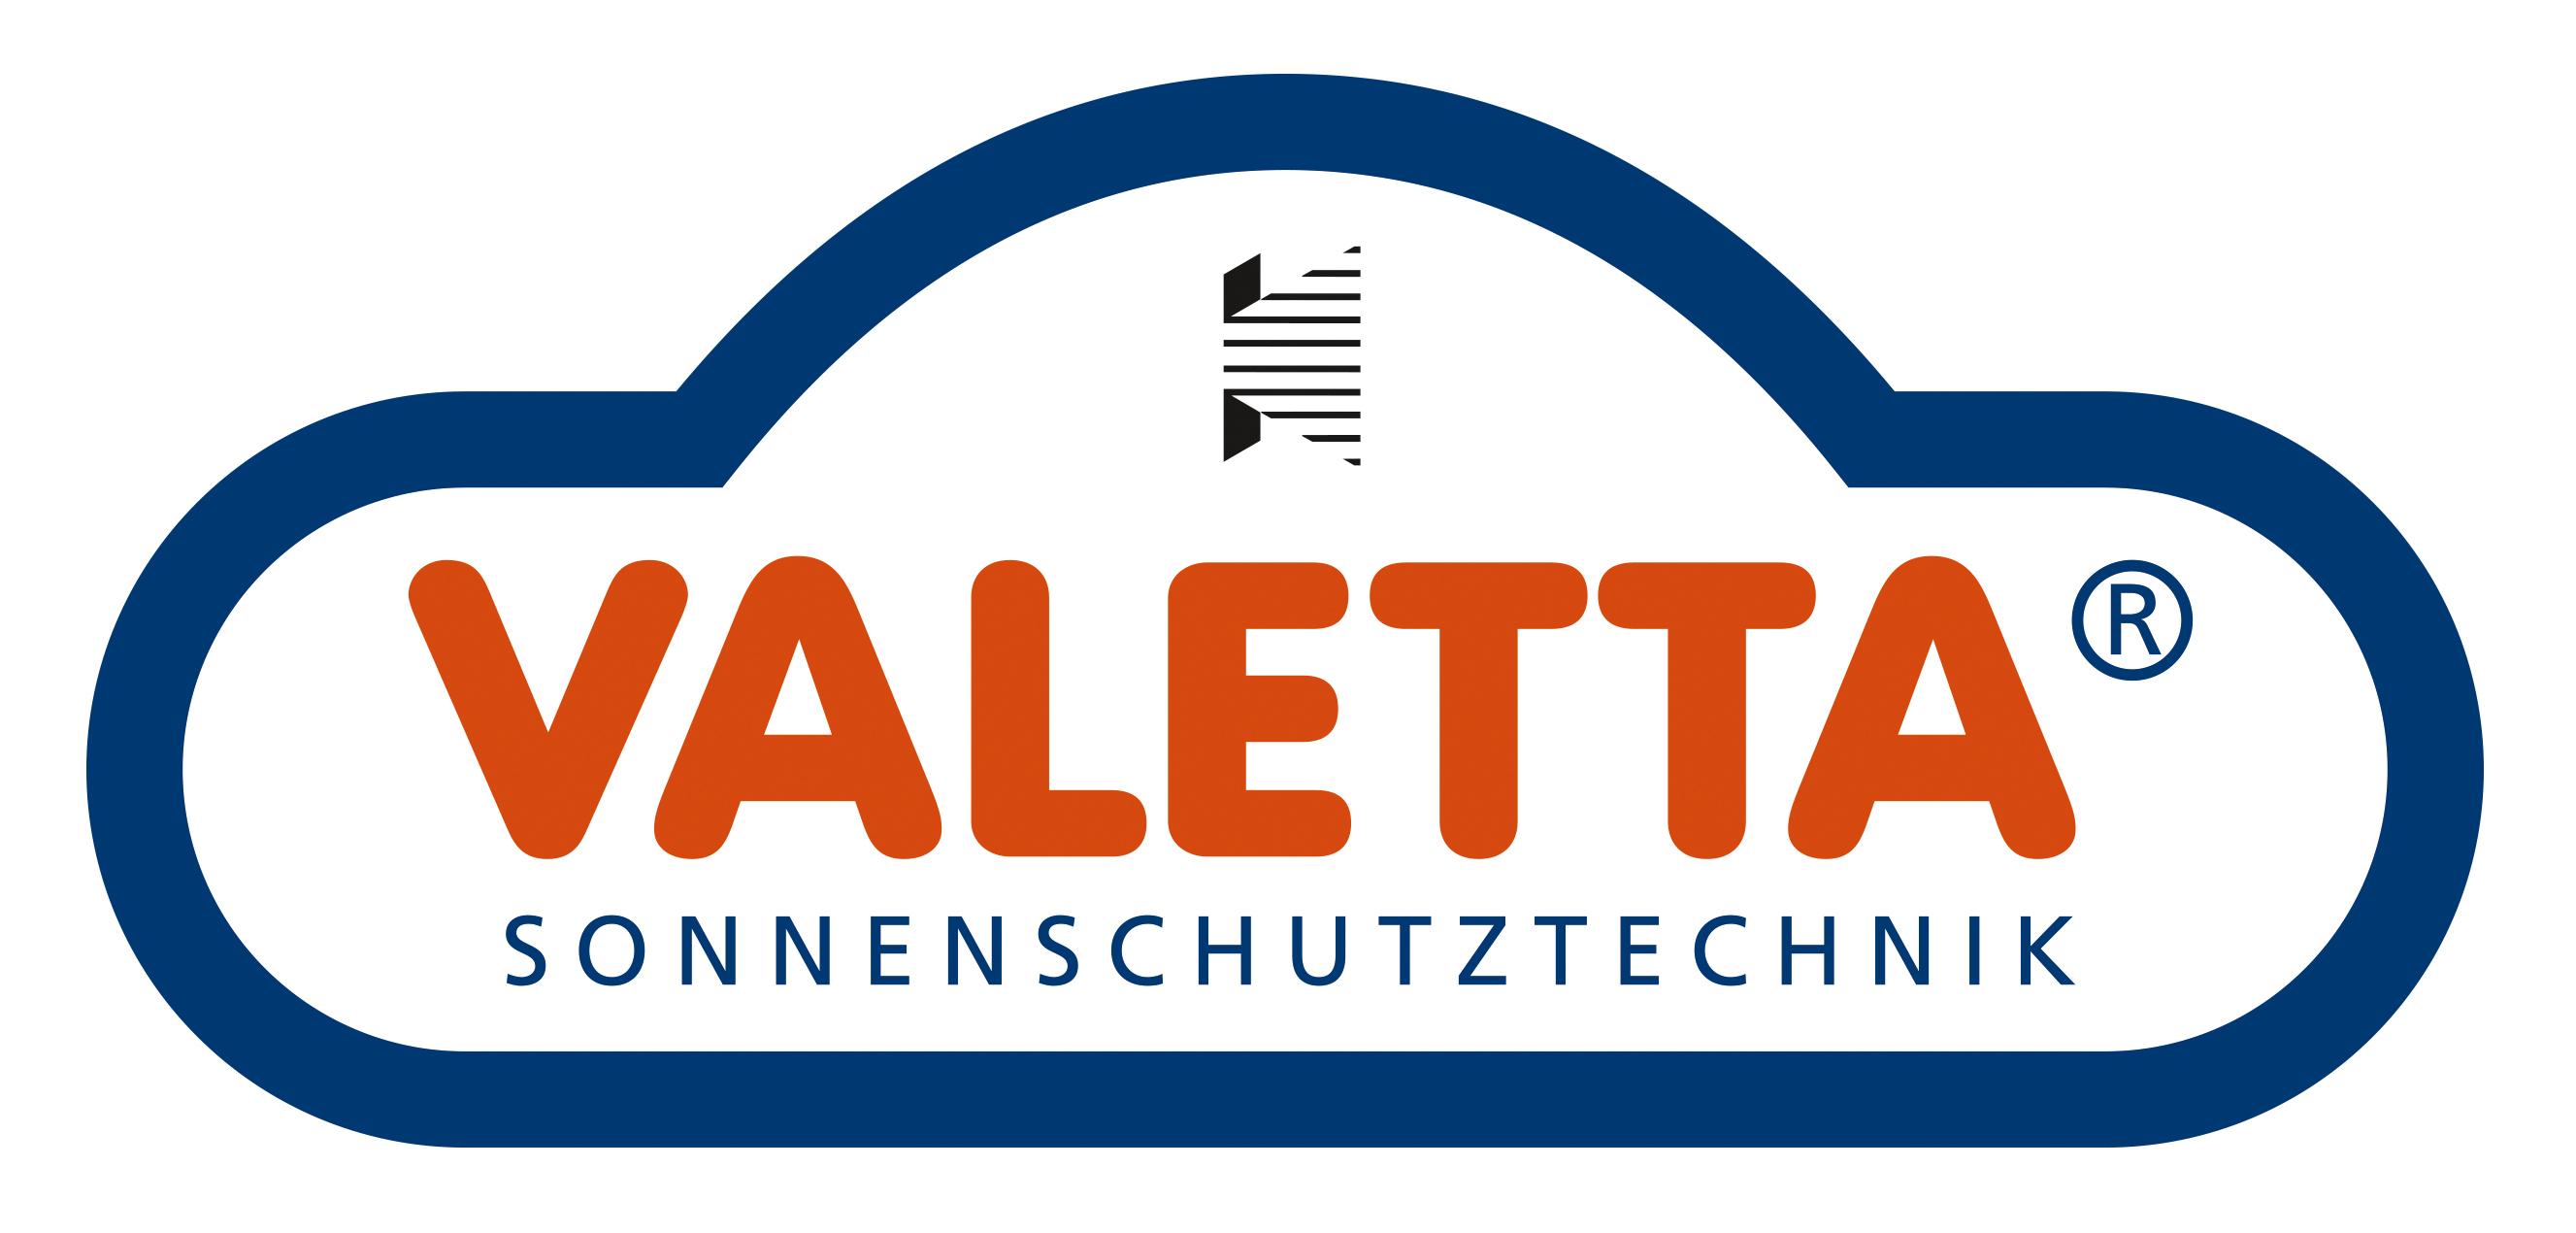 VALETTA Sonnenschutztechnik